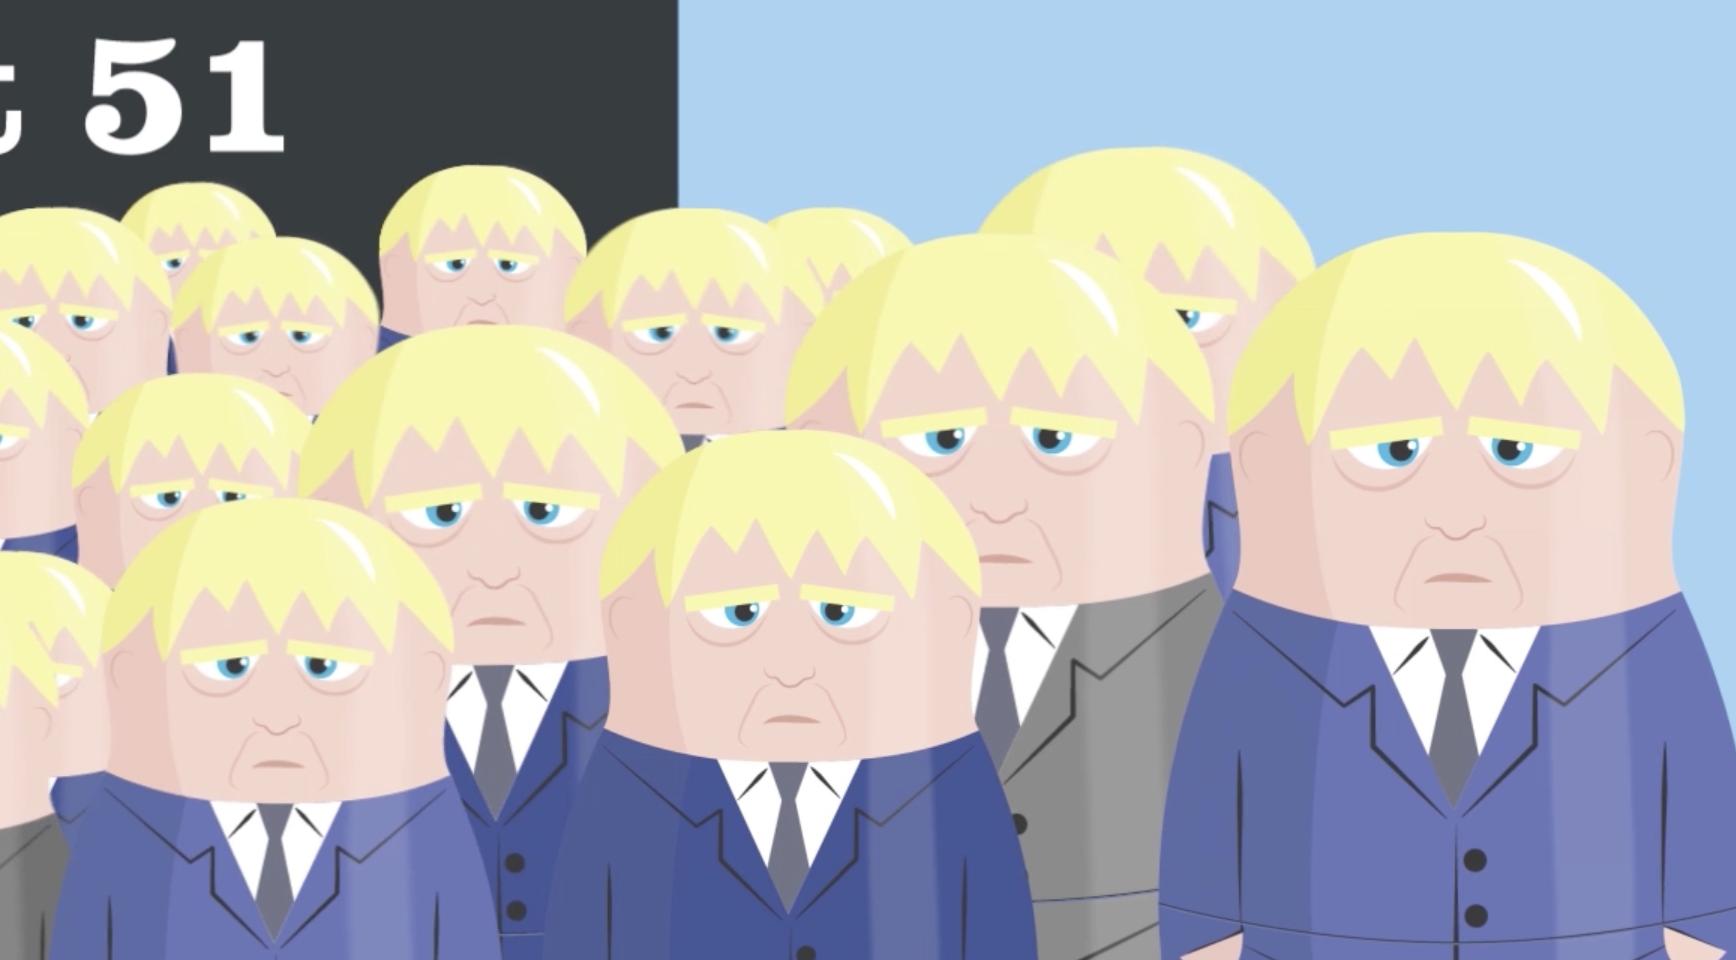 Lots of Russian Dolls that look like Boris Johnson